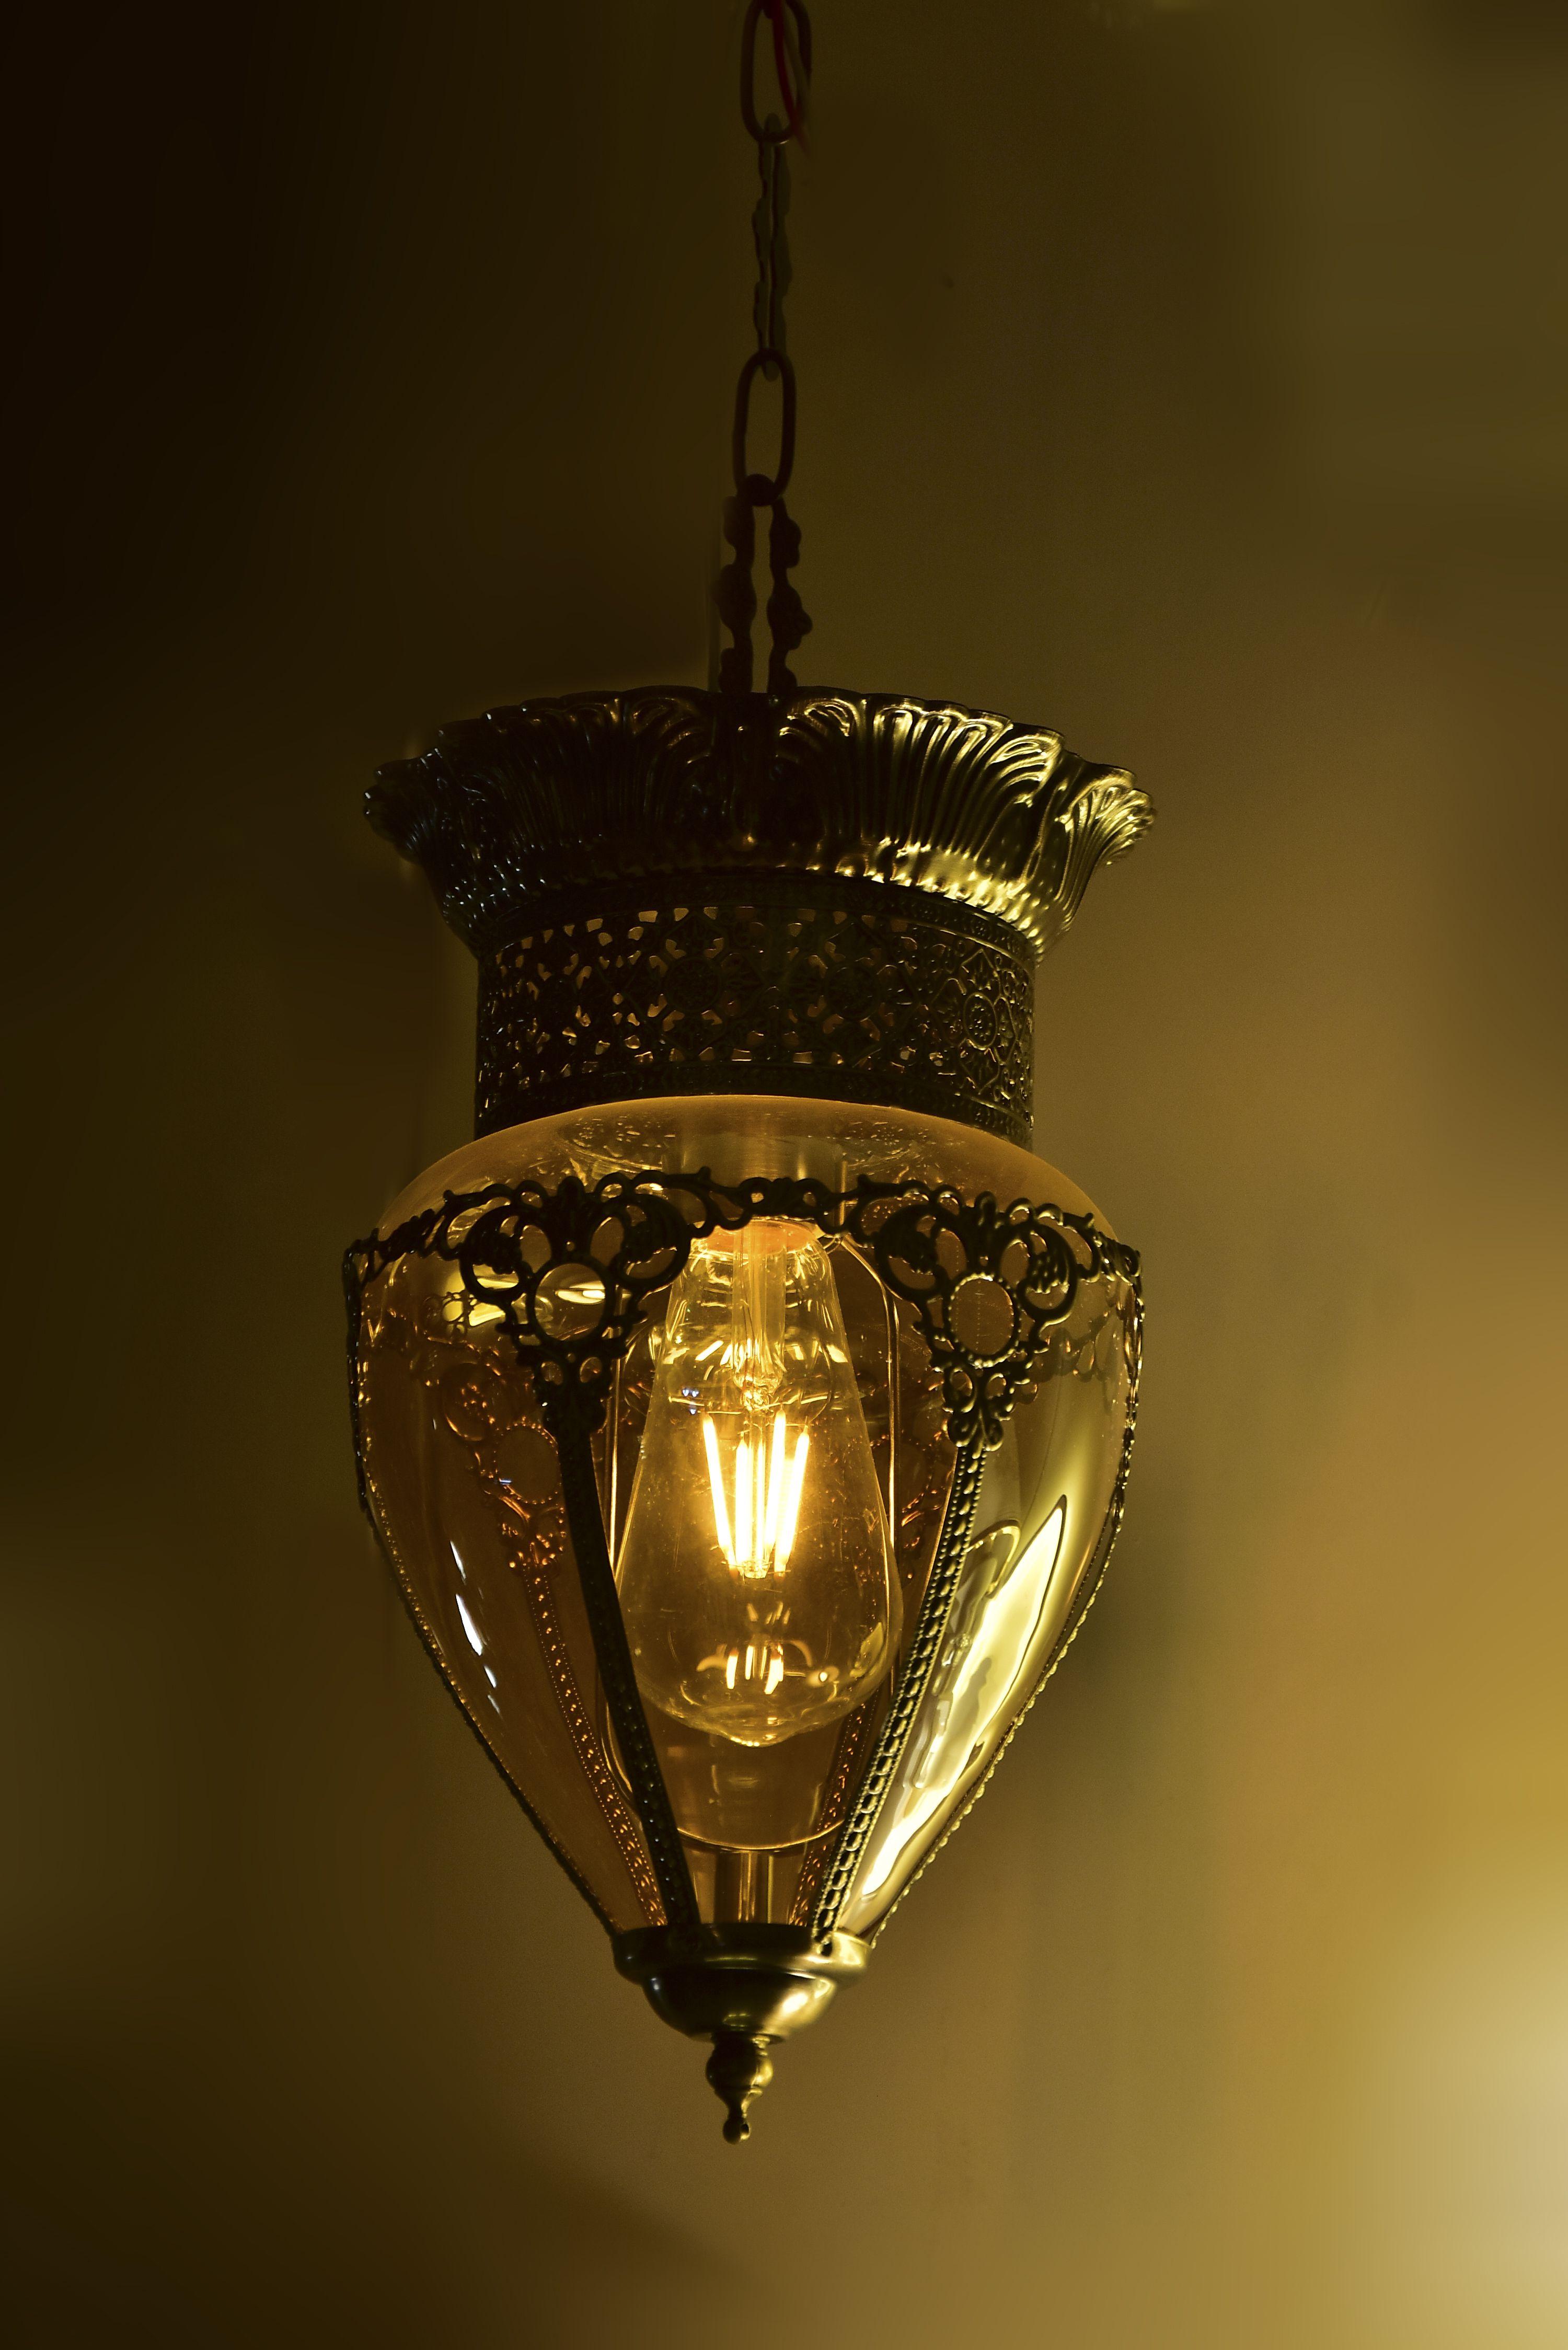 Antique-metallic-hanging